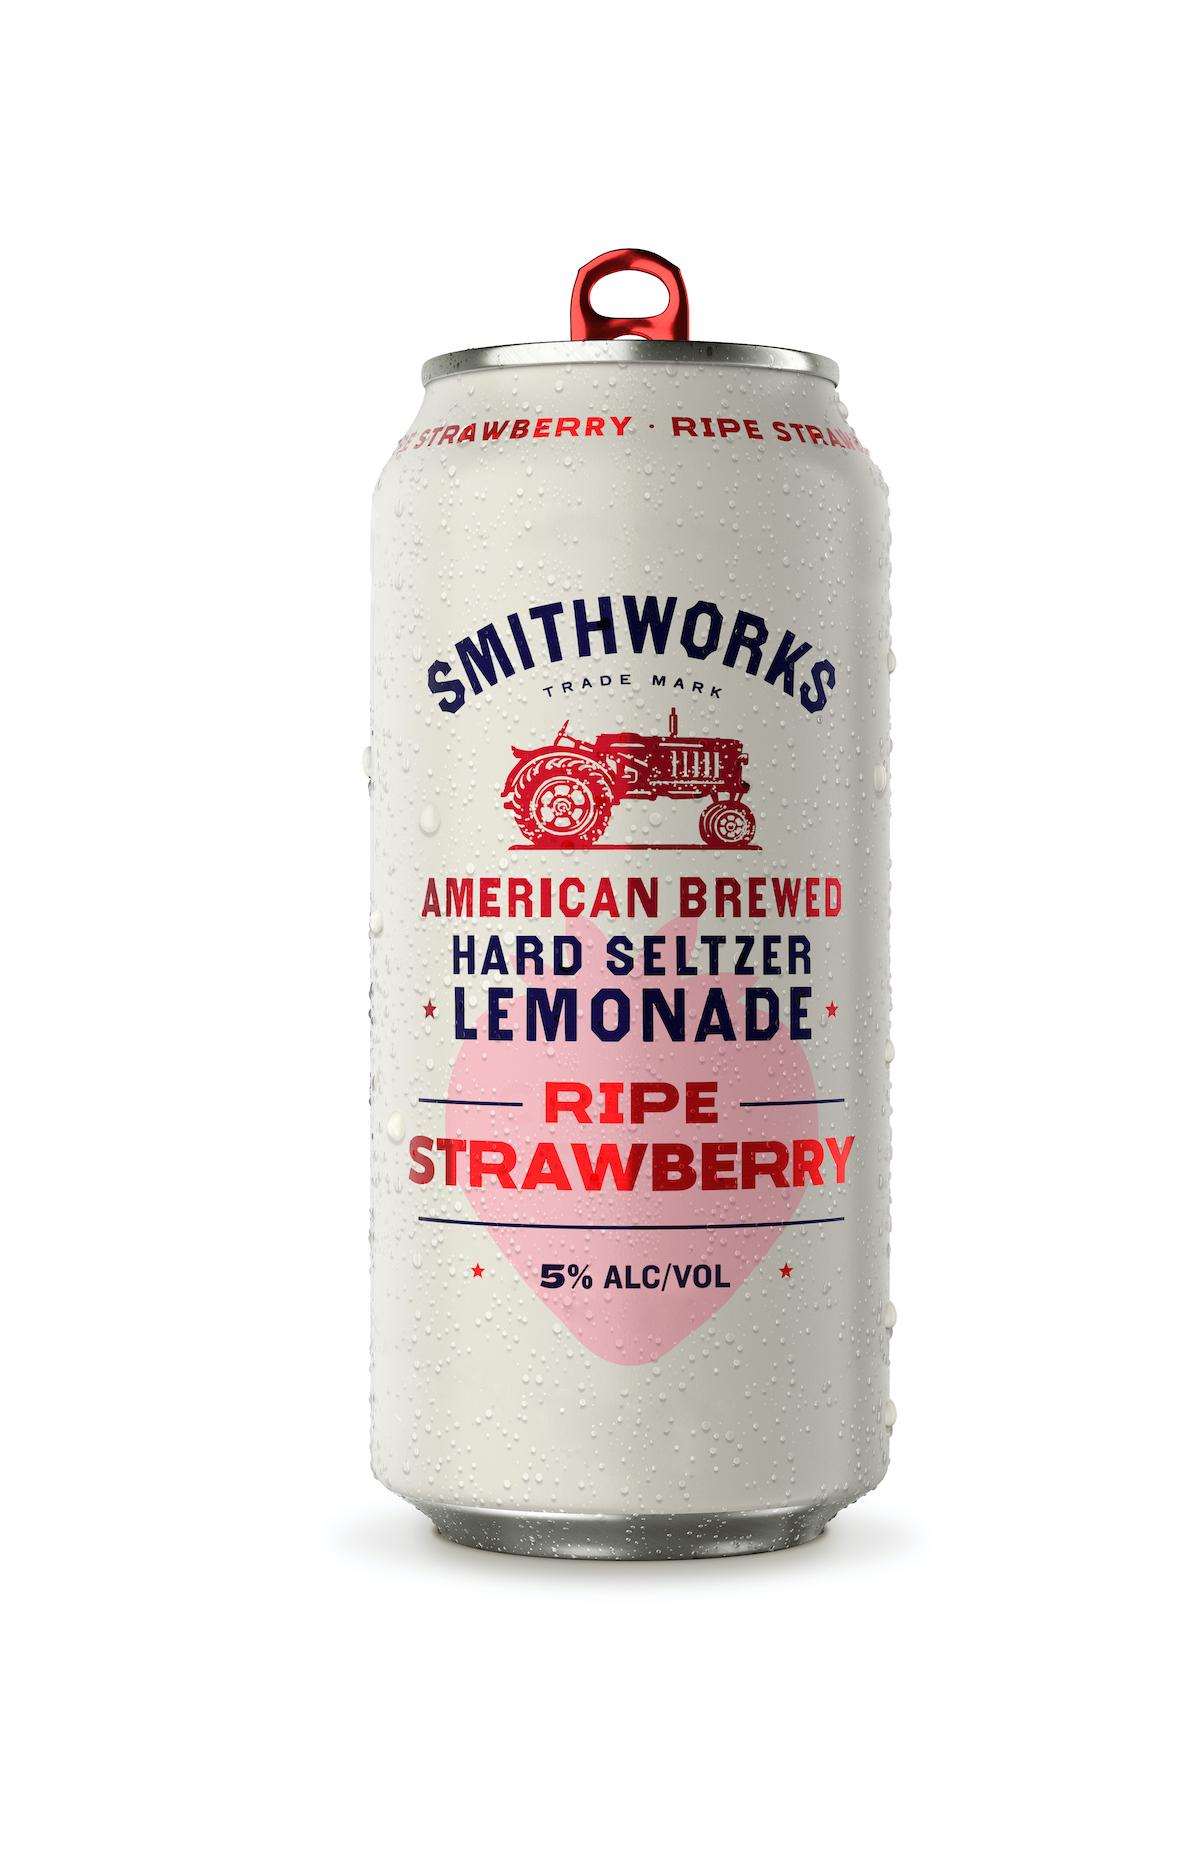 Smithworks Hard Seltzer can